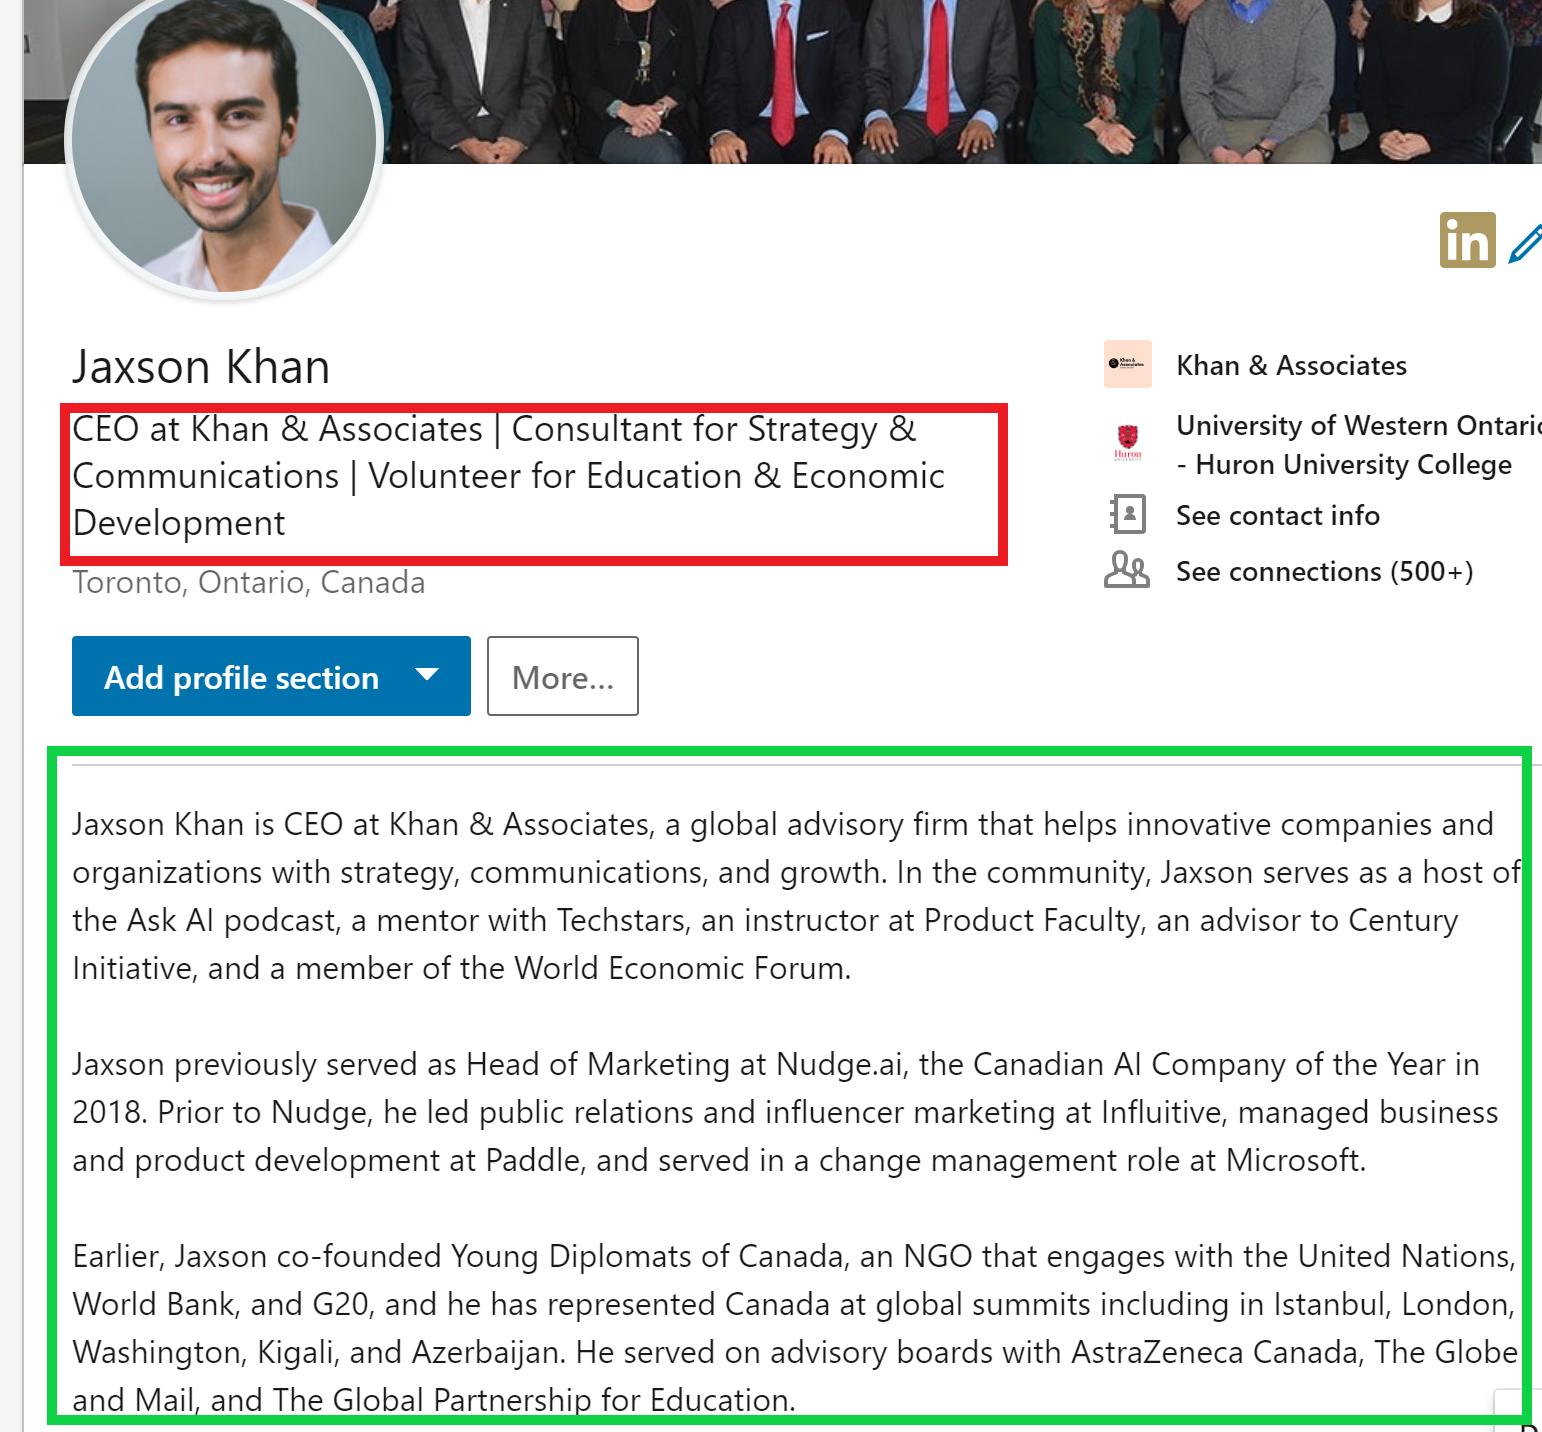 Jaxson Khan LinkedIn profile - after